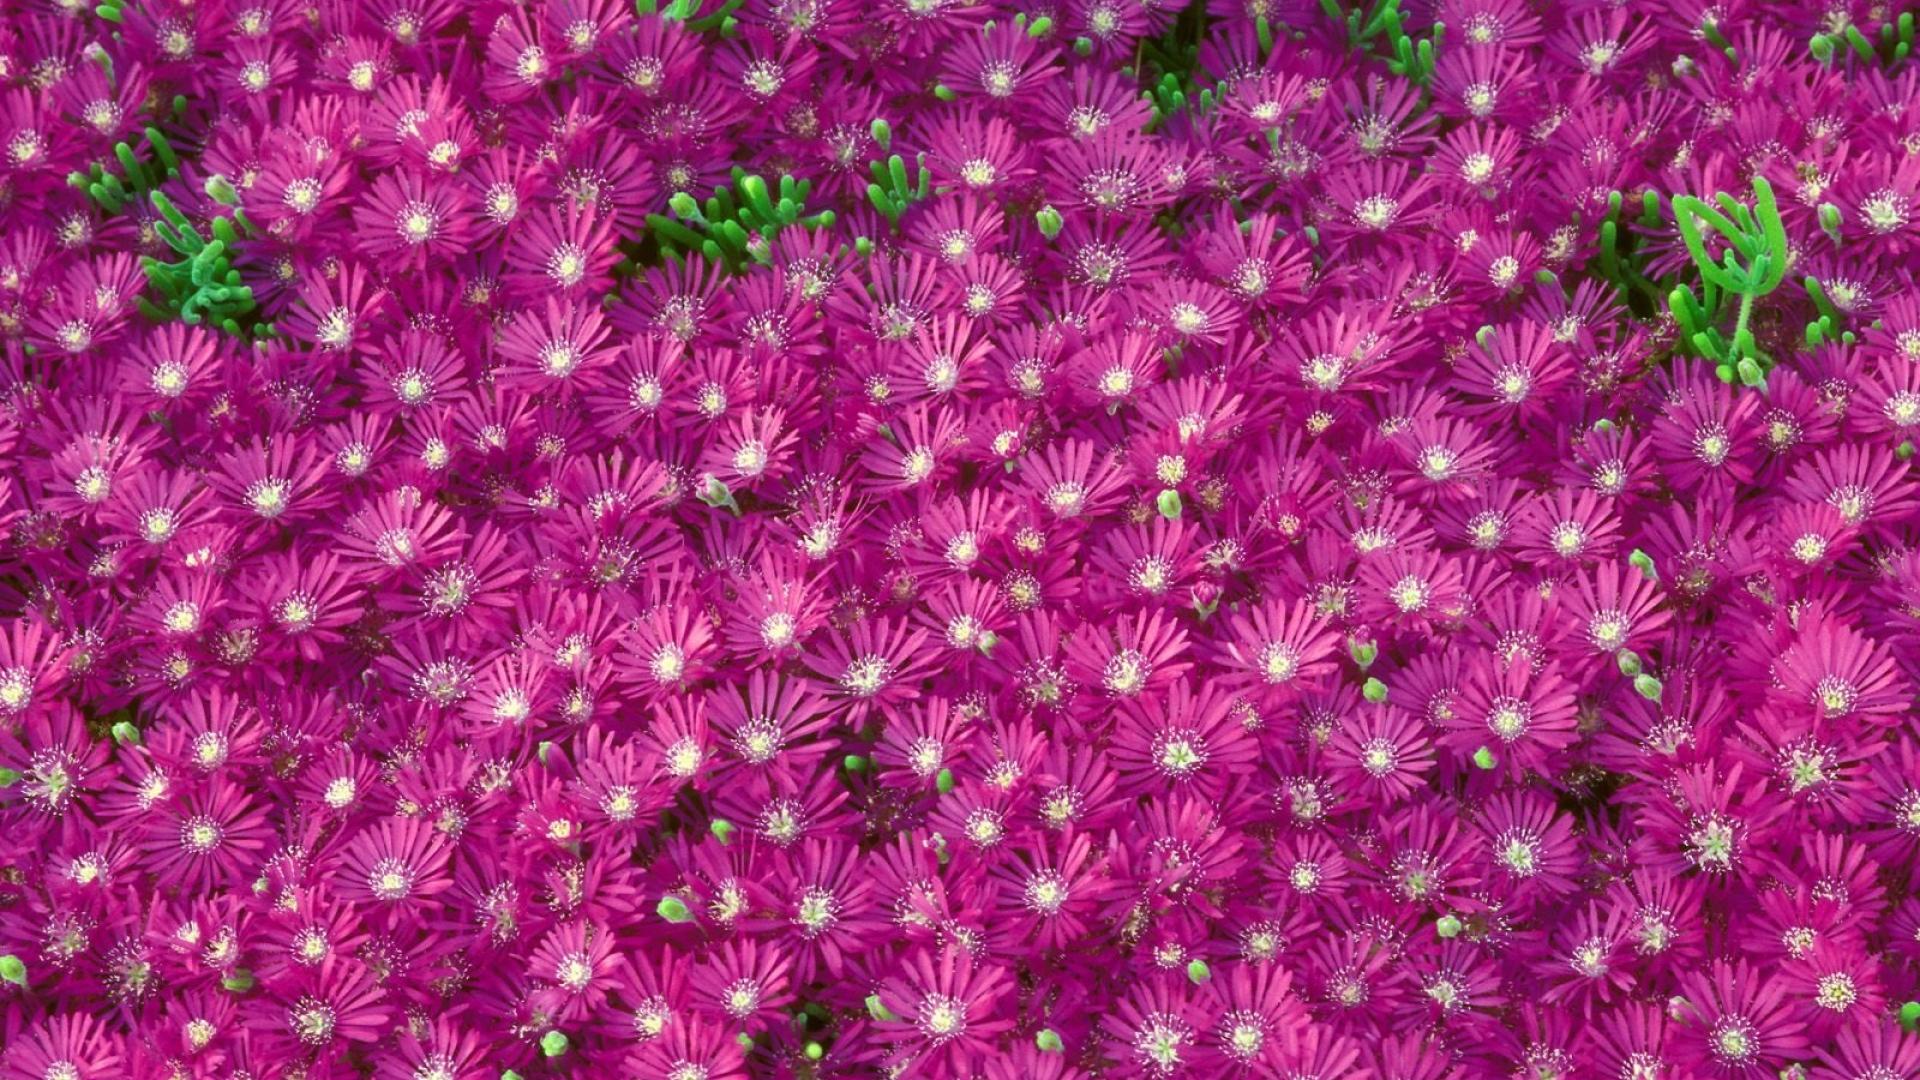 Download Wallpaper 1920x1080 Colors Carpet Small Bright Full Hd 1080p Hd Background